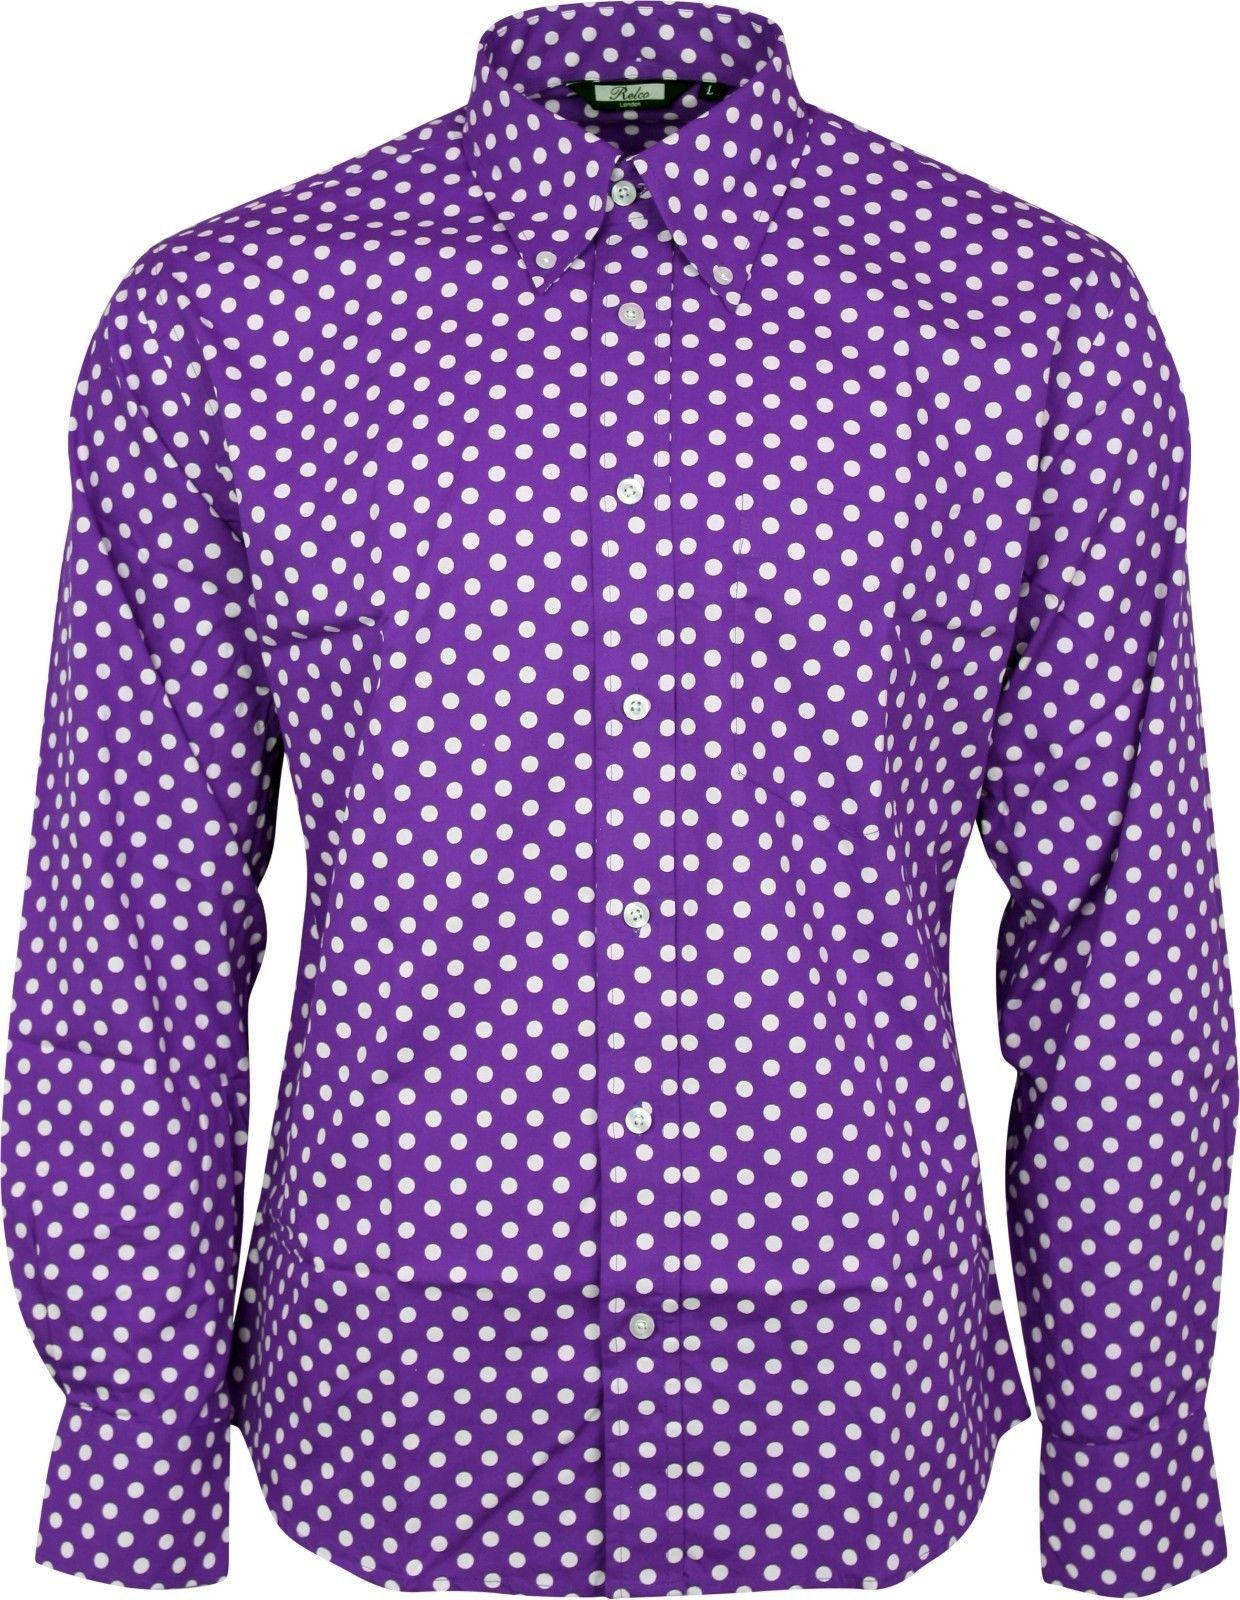 d6d7bb943f17 Relco Mens Purple & White Polka Dot Long Sleeved Shirt Mod Skin Retro Indie  60S